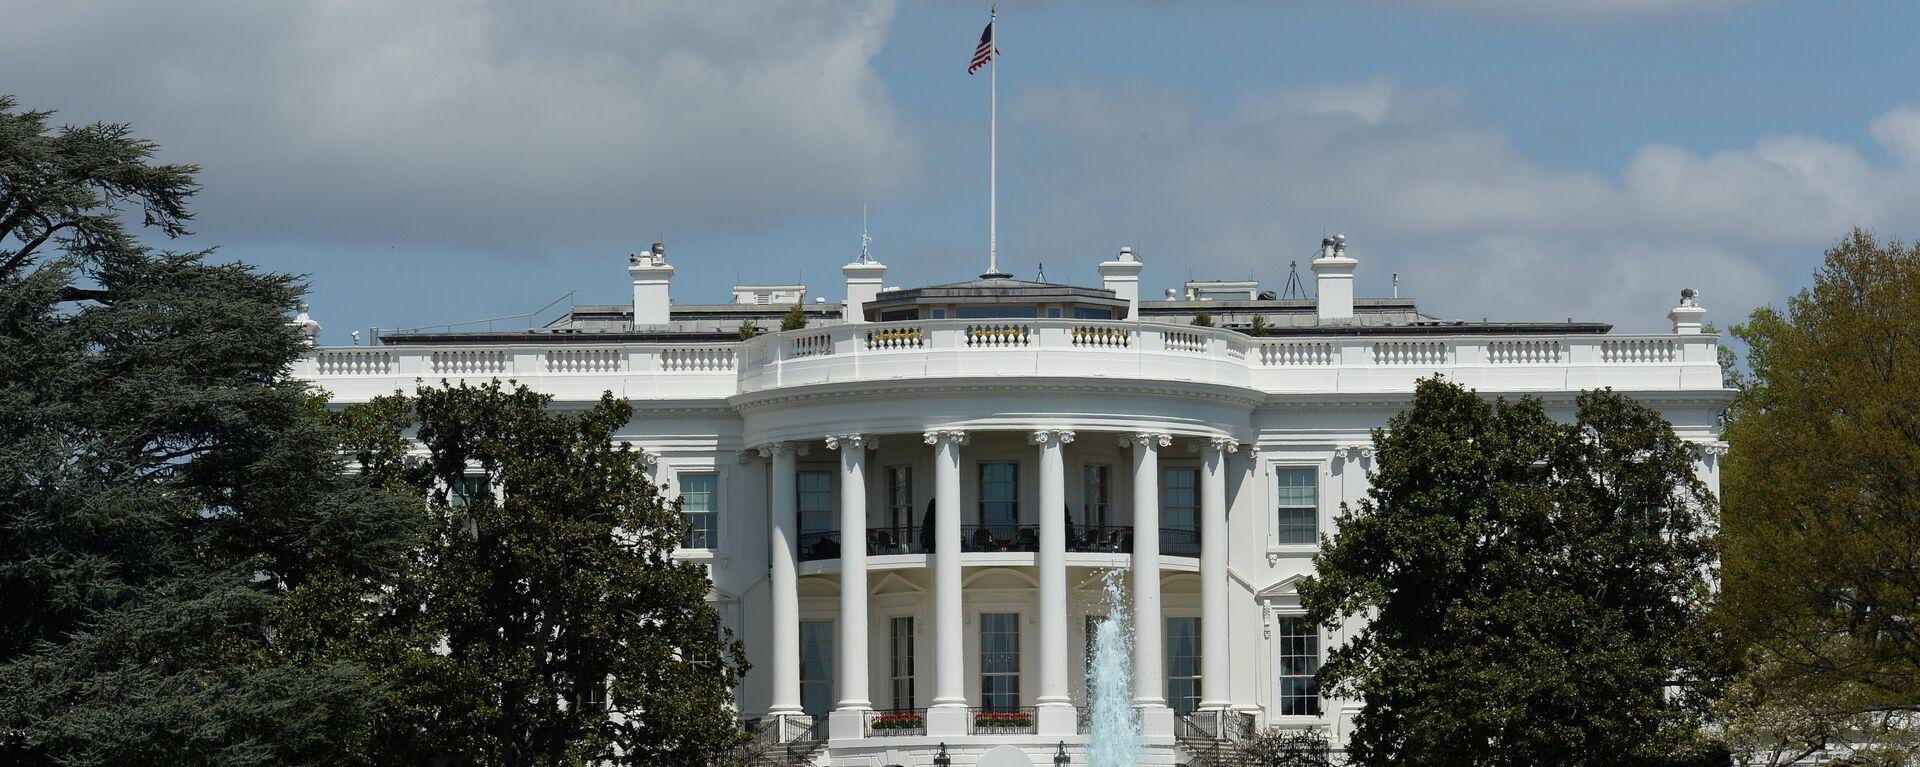 Official residence of the U.S. President, the White House in Washington D.C. - Sputnik International, 1920